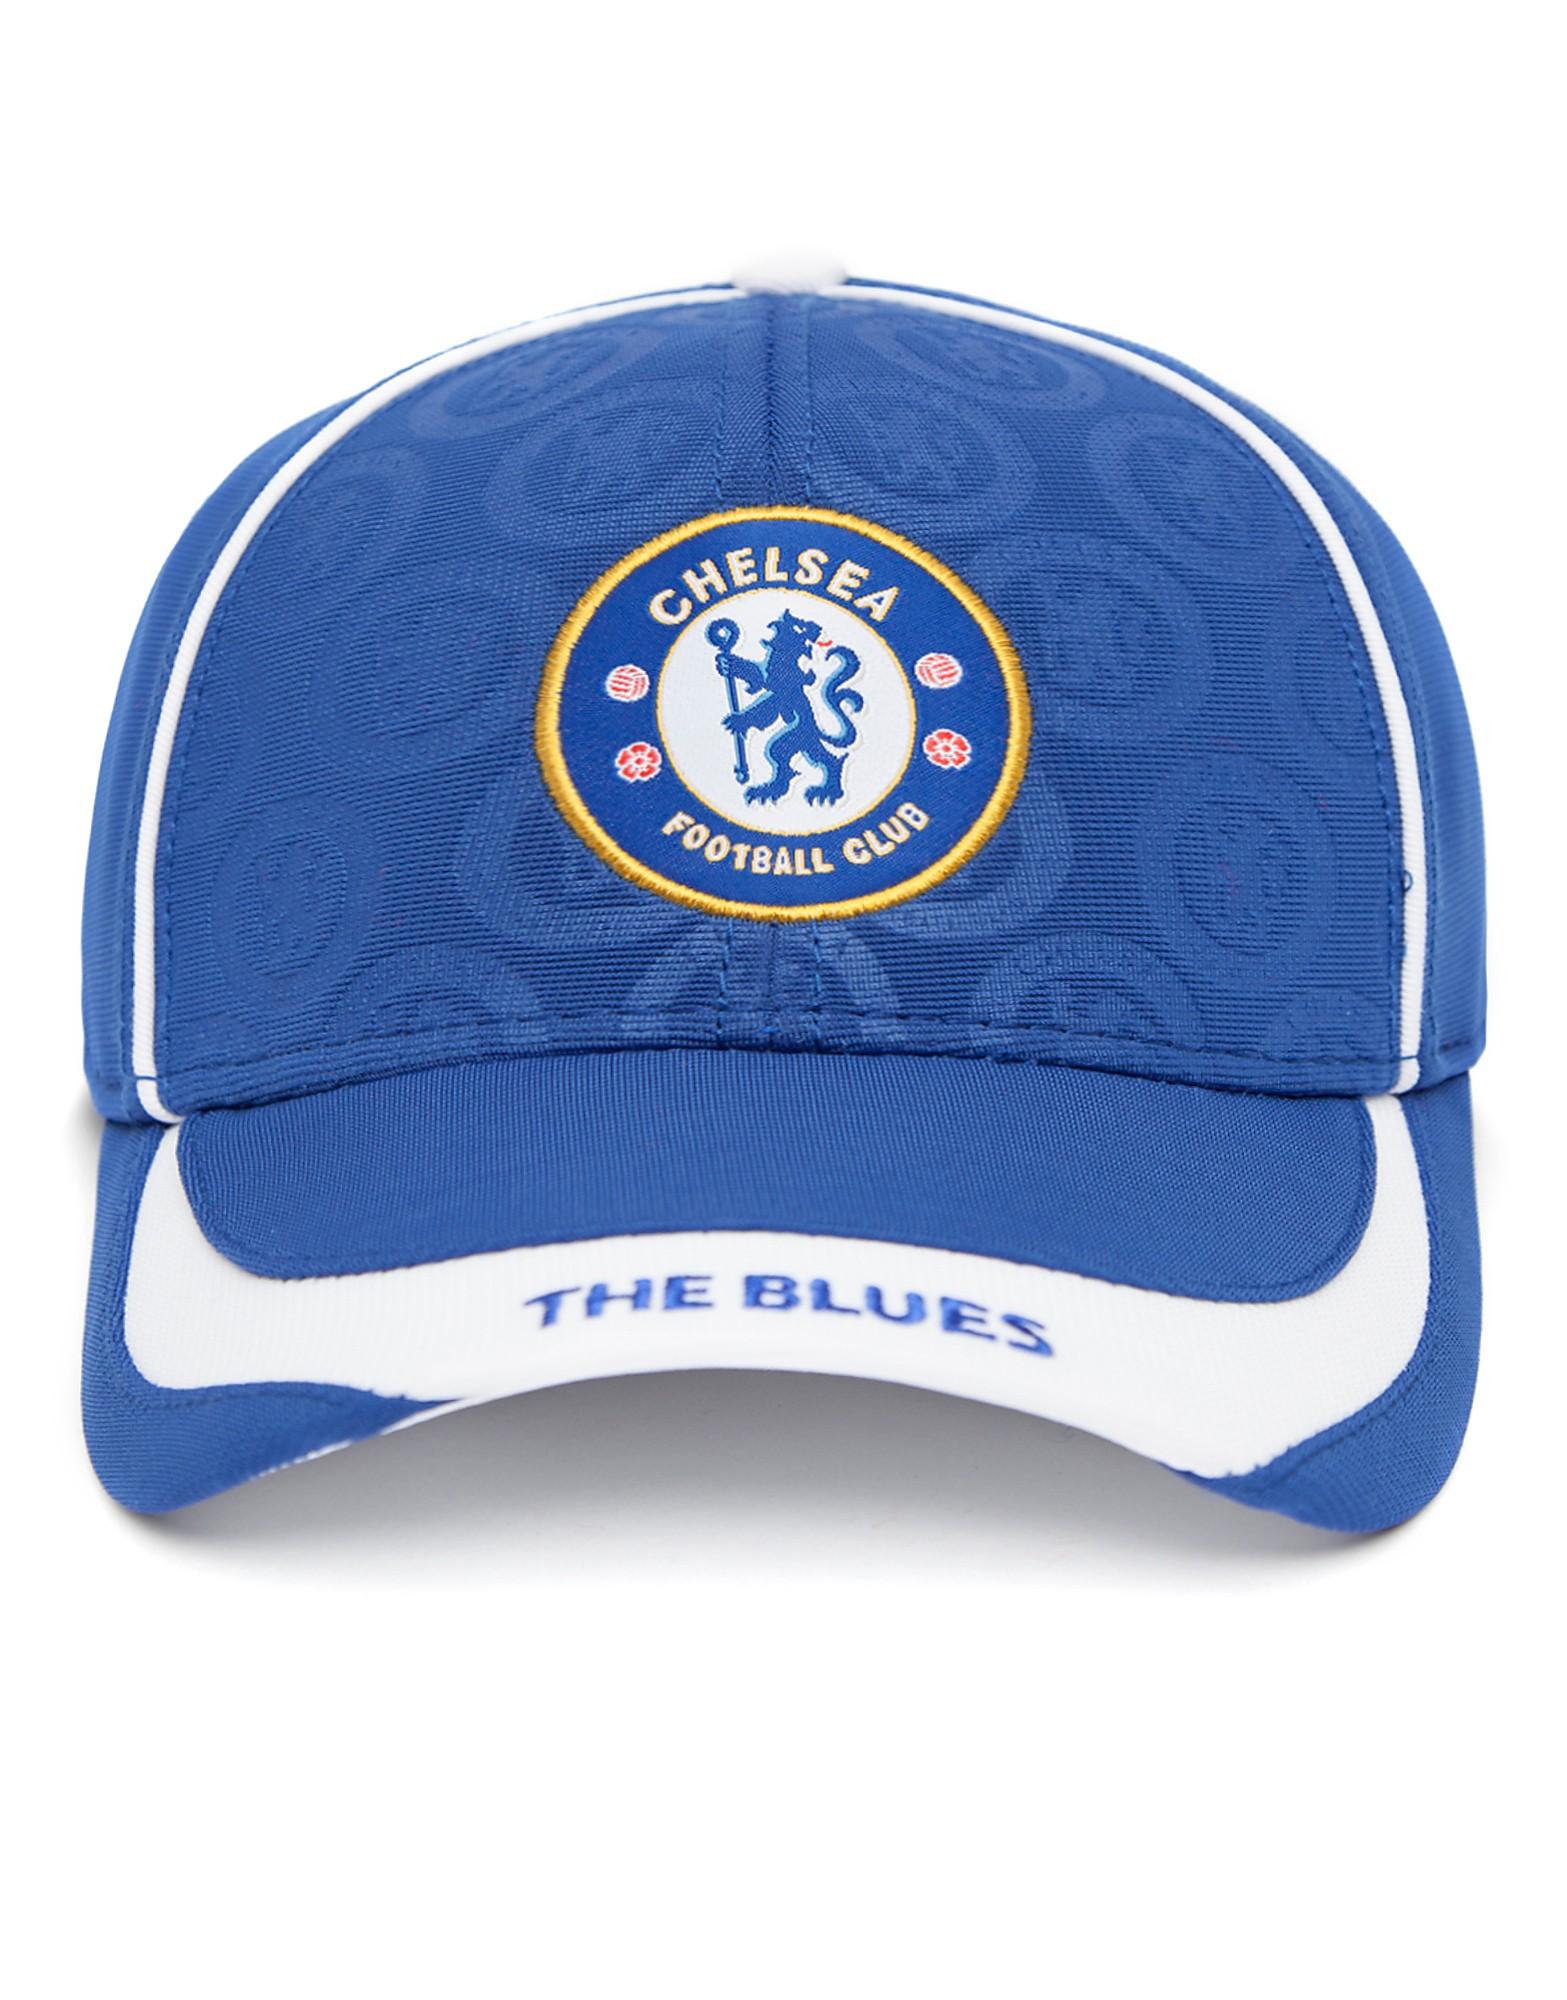 Official Team Chelsea FC Deboss Cap - Royal Blue - Mens, Royal Blue